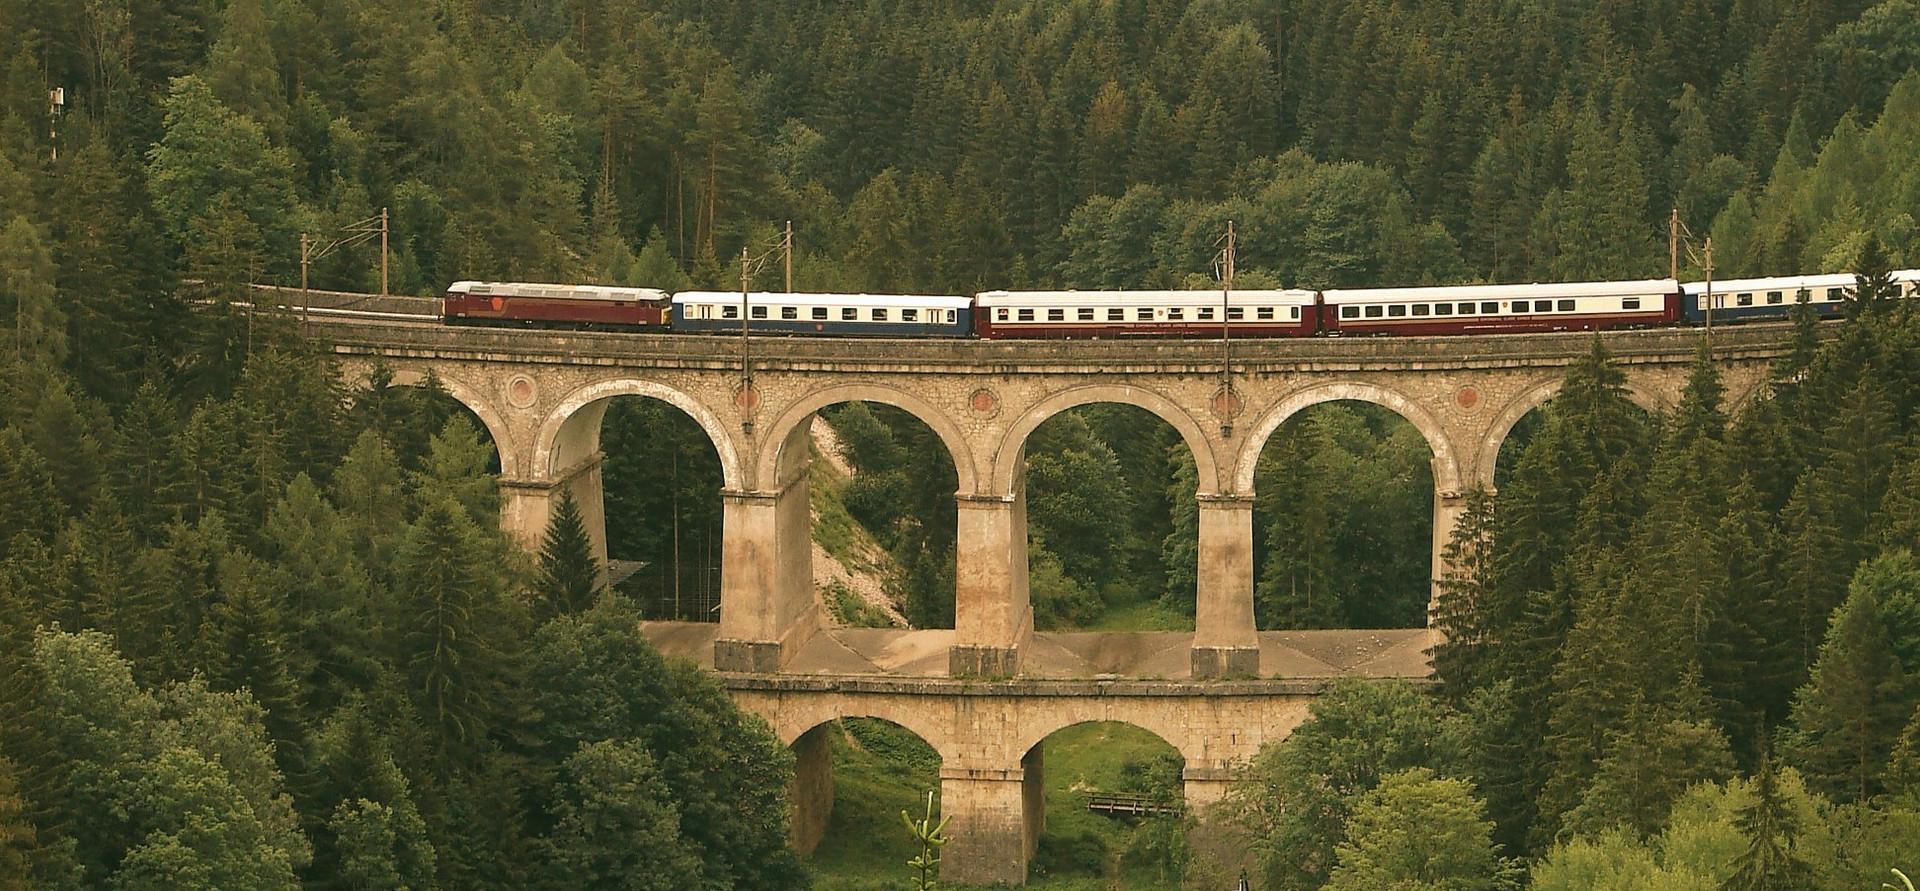 LUXURY TRAIN TOURS